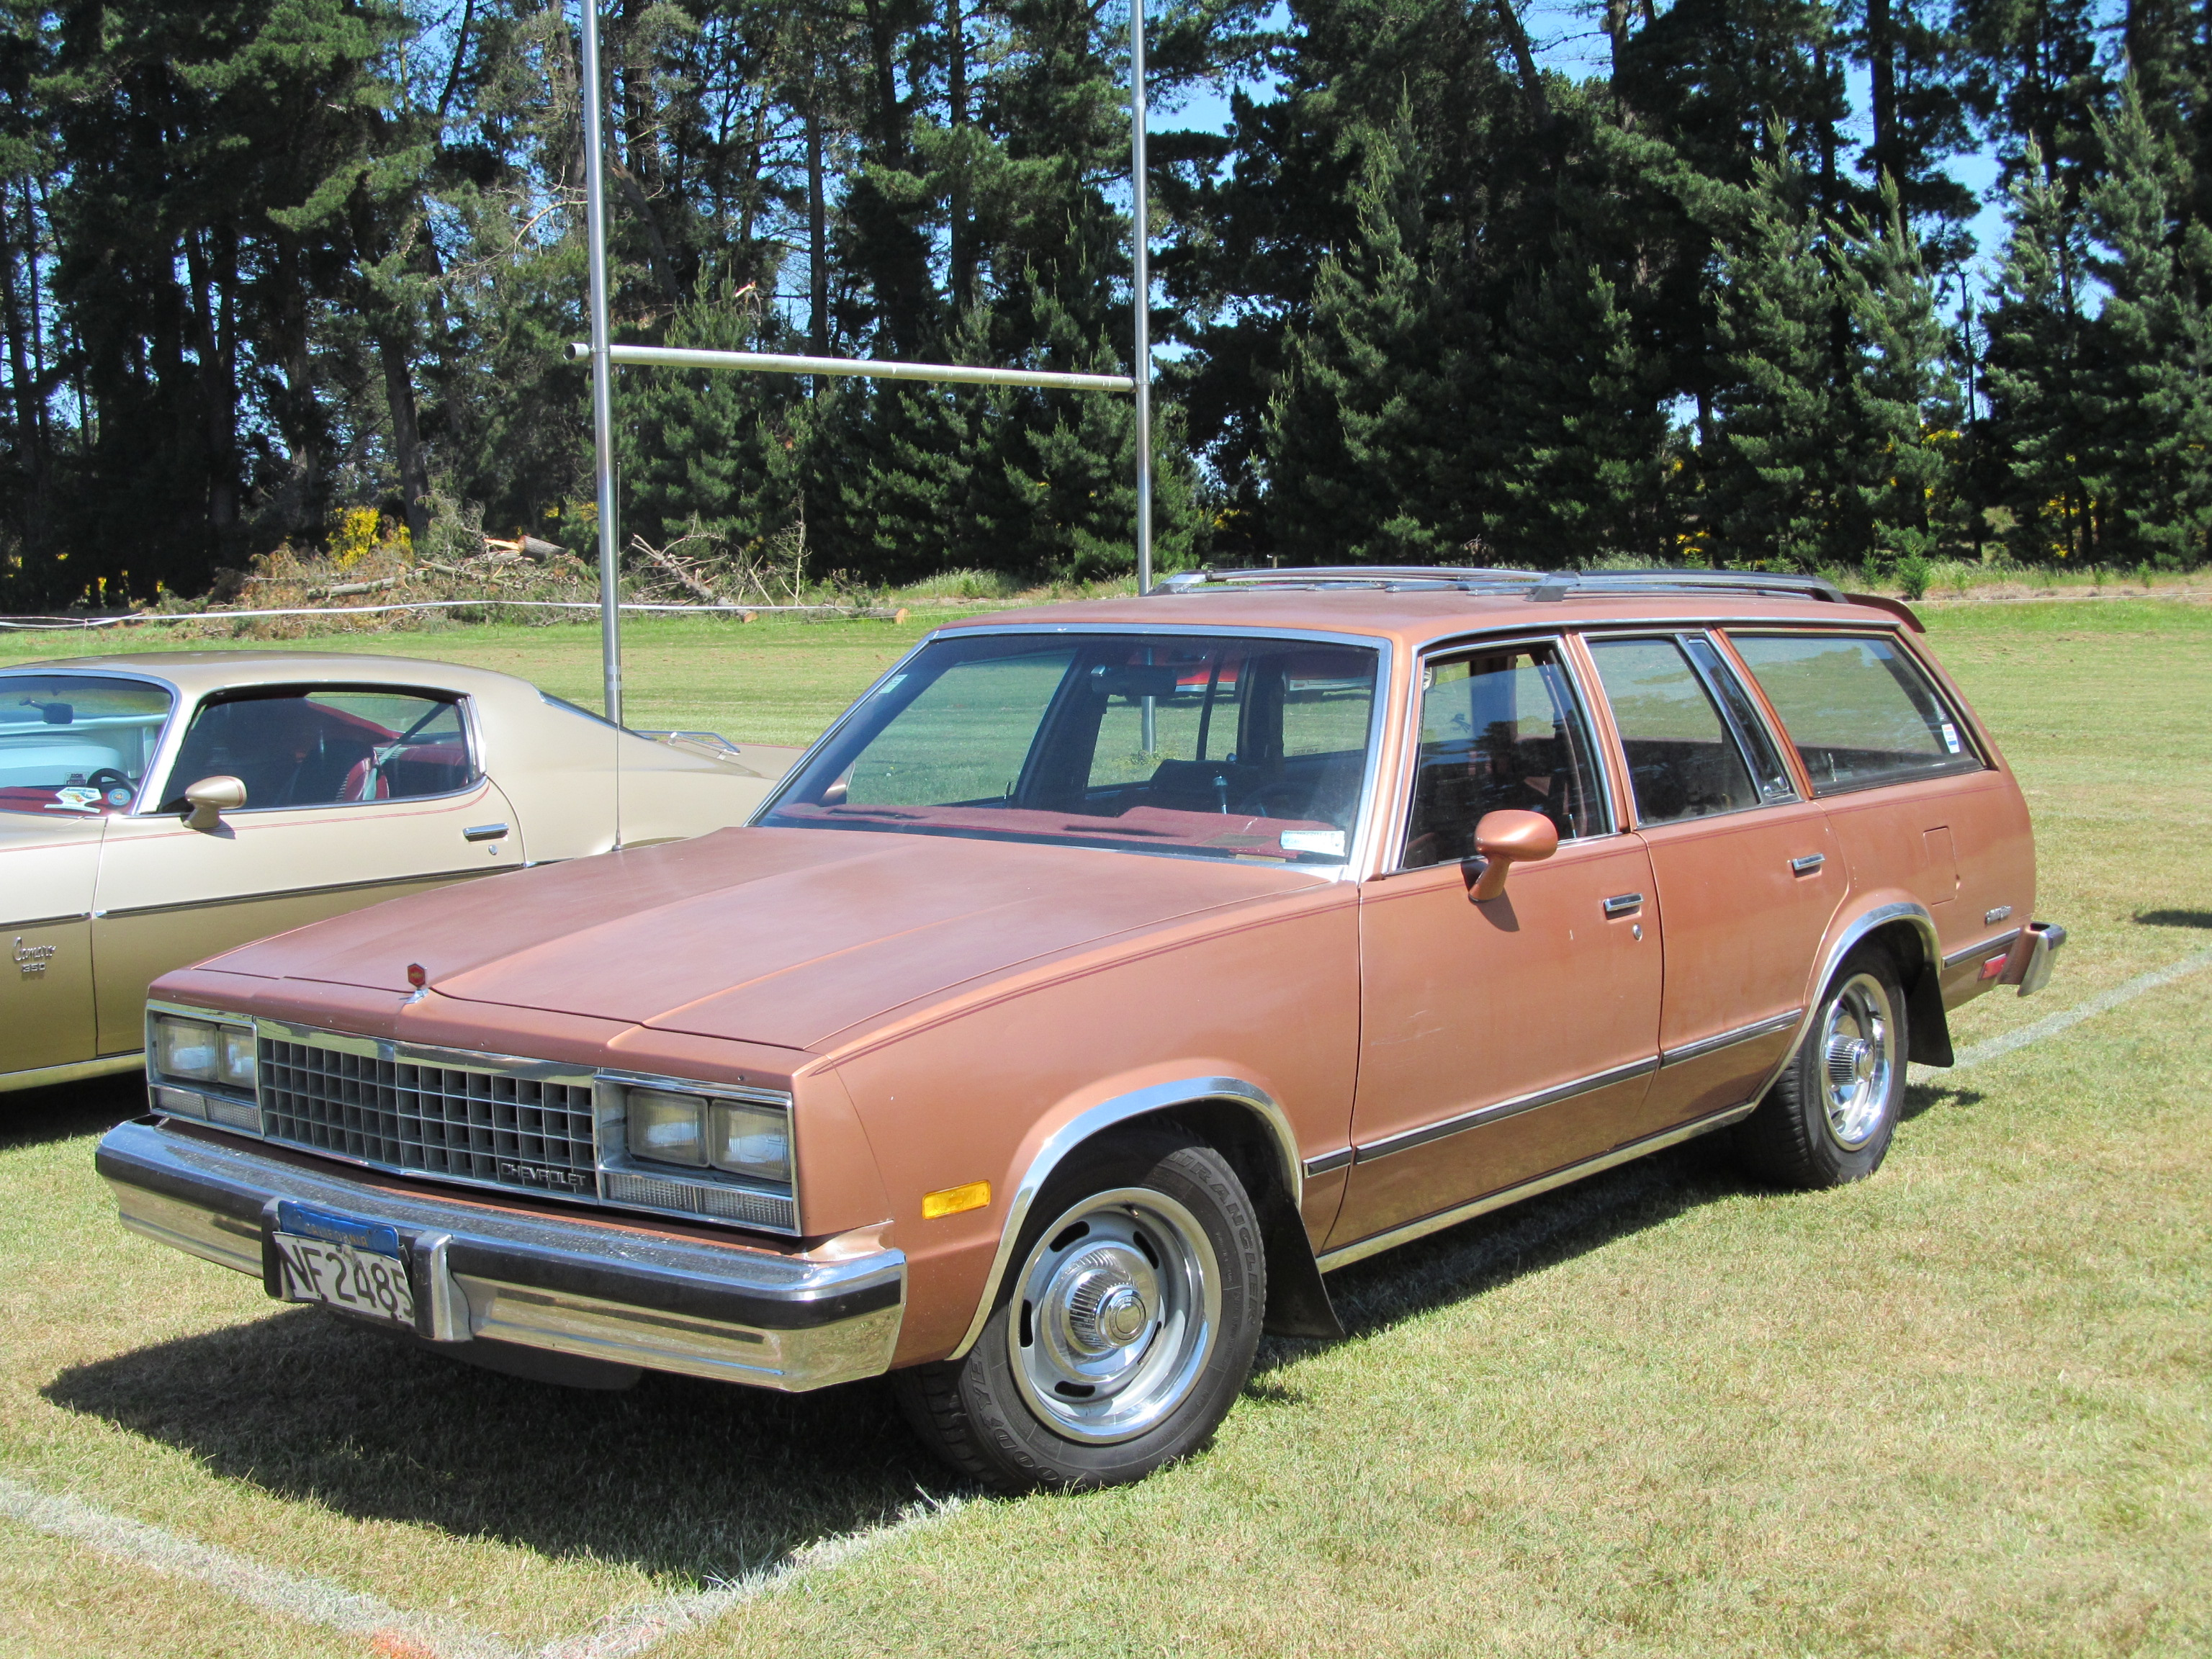 File:1982 Chevrolet Malibu Station Wagon (11265683595) jpg